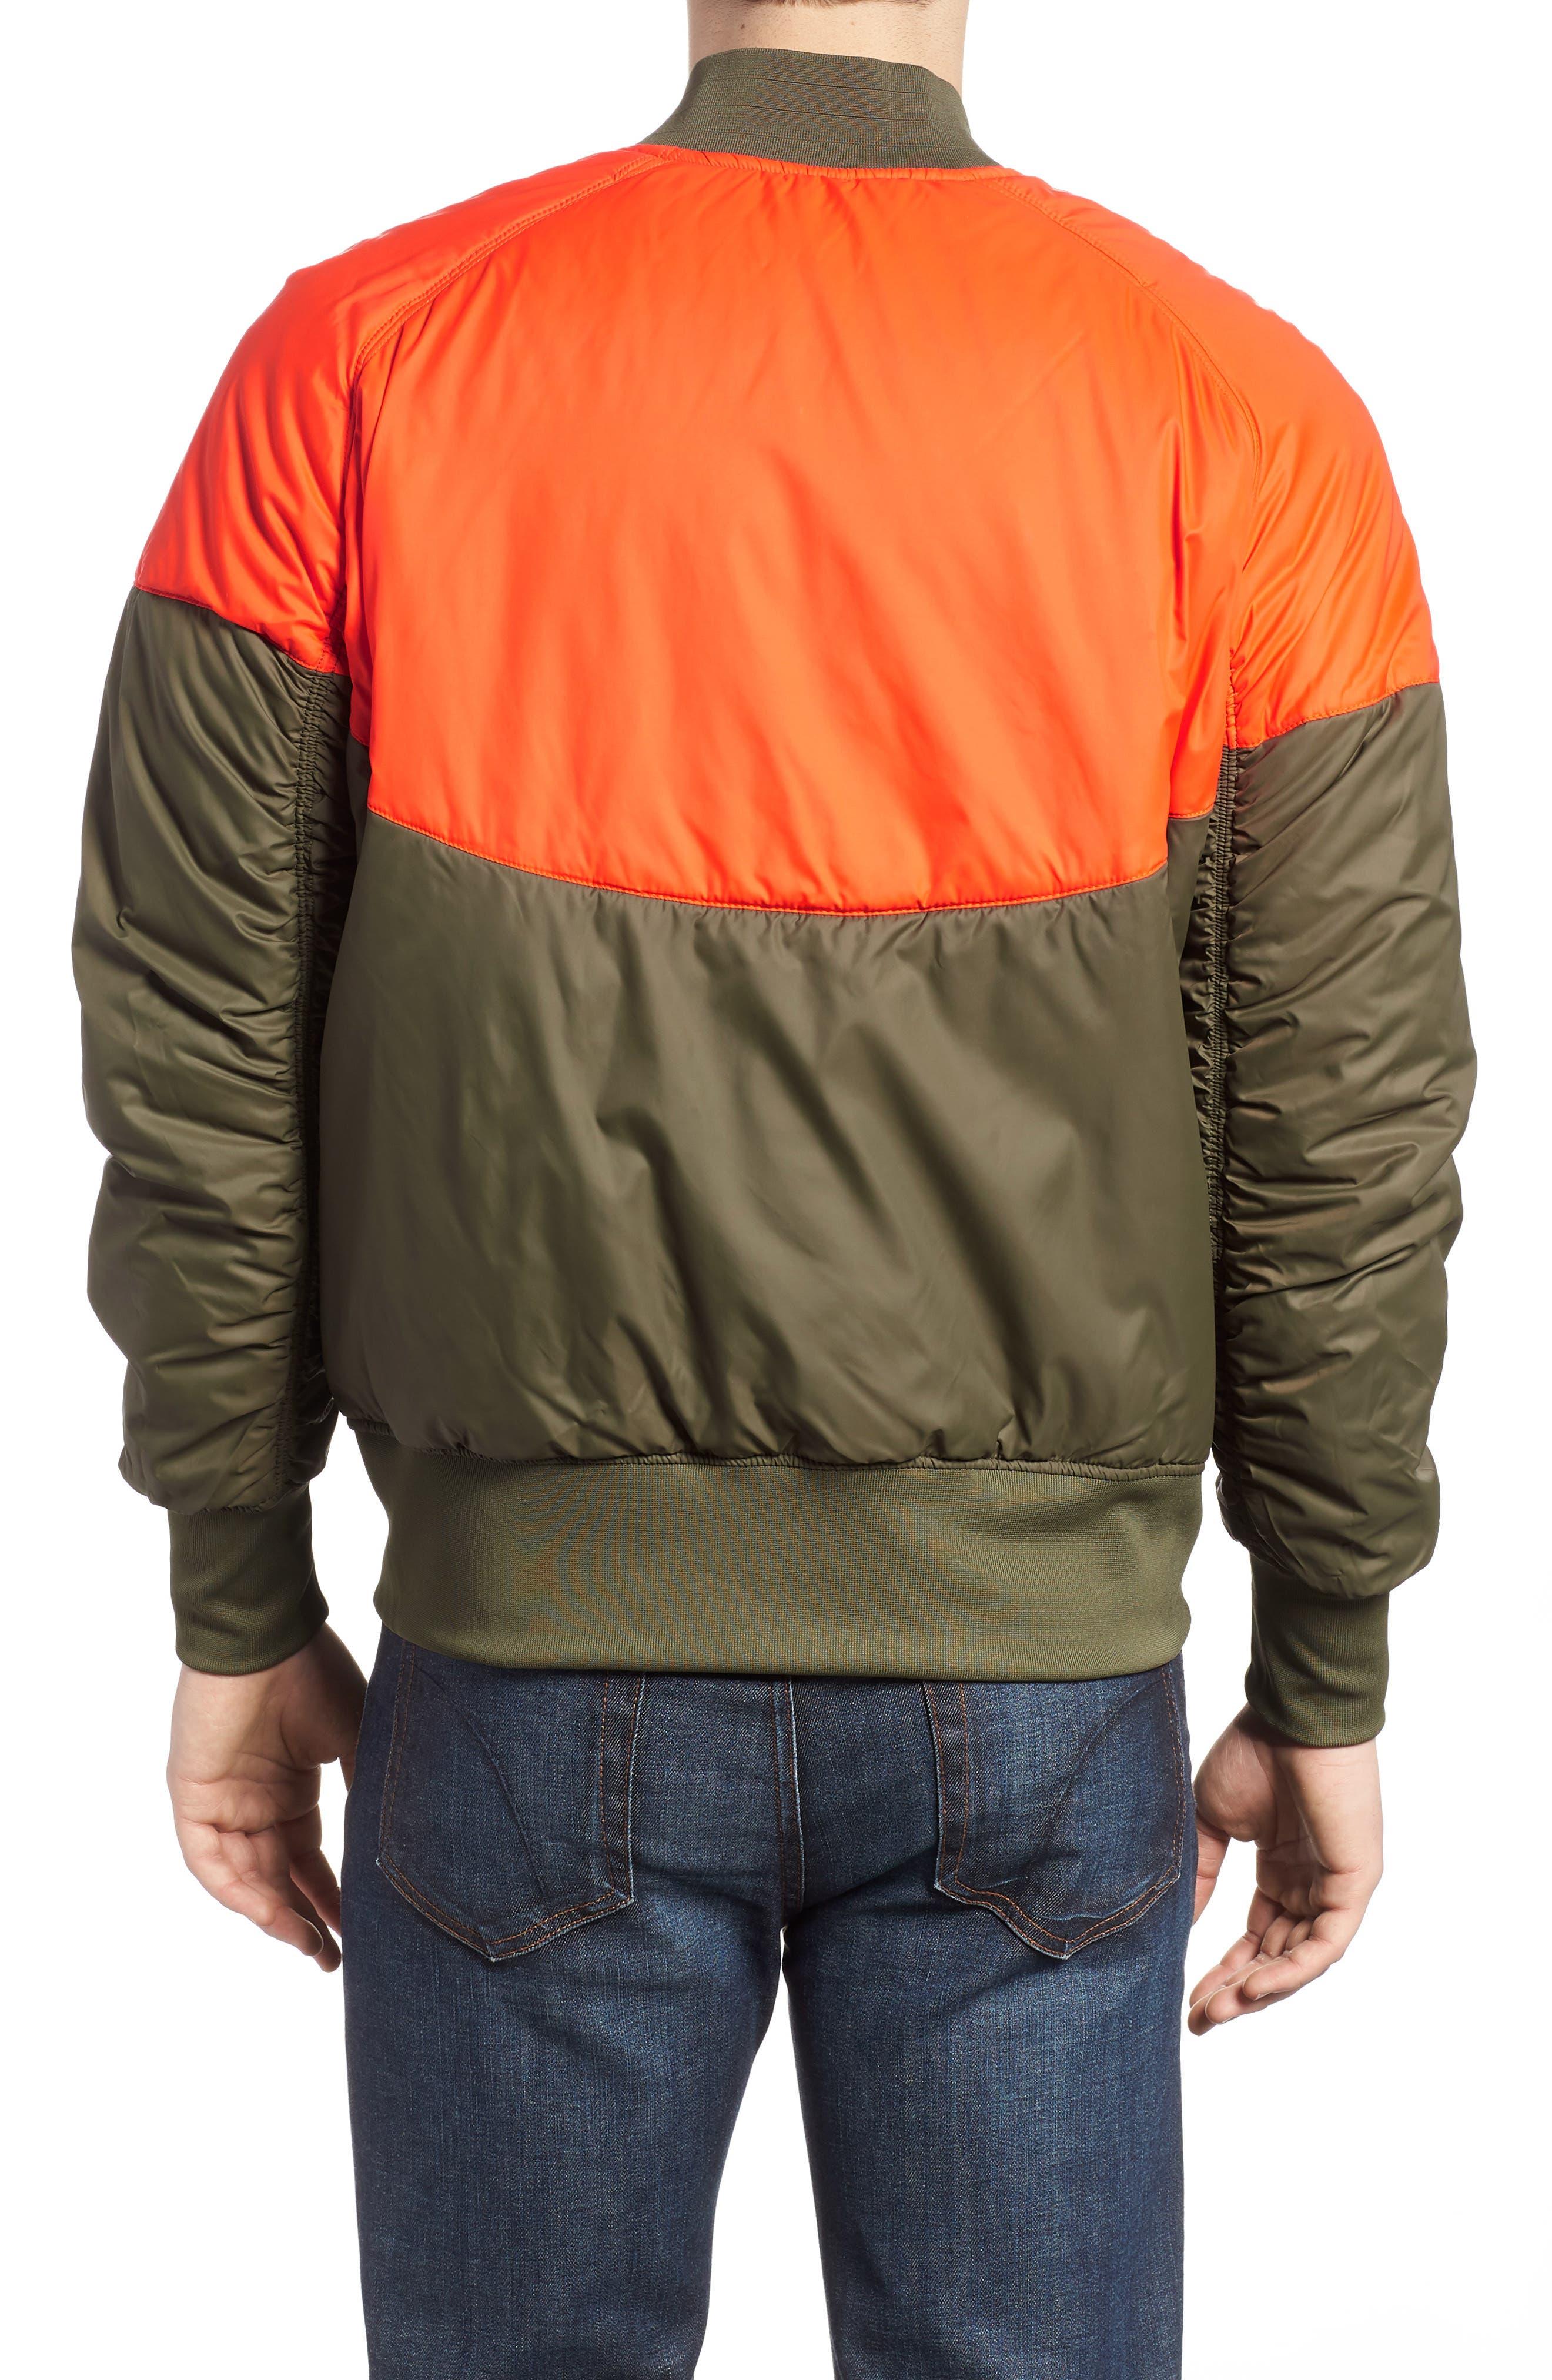 NSW Air Force 1 Jacket,                             Alternate thumbnail 2, color,                             Medium Olive/ Orange/ Olive